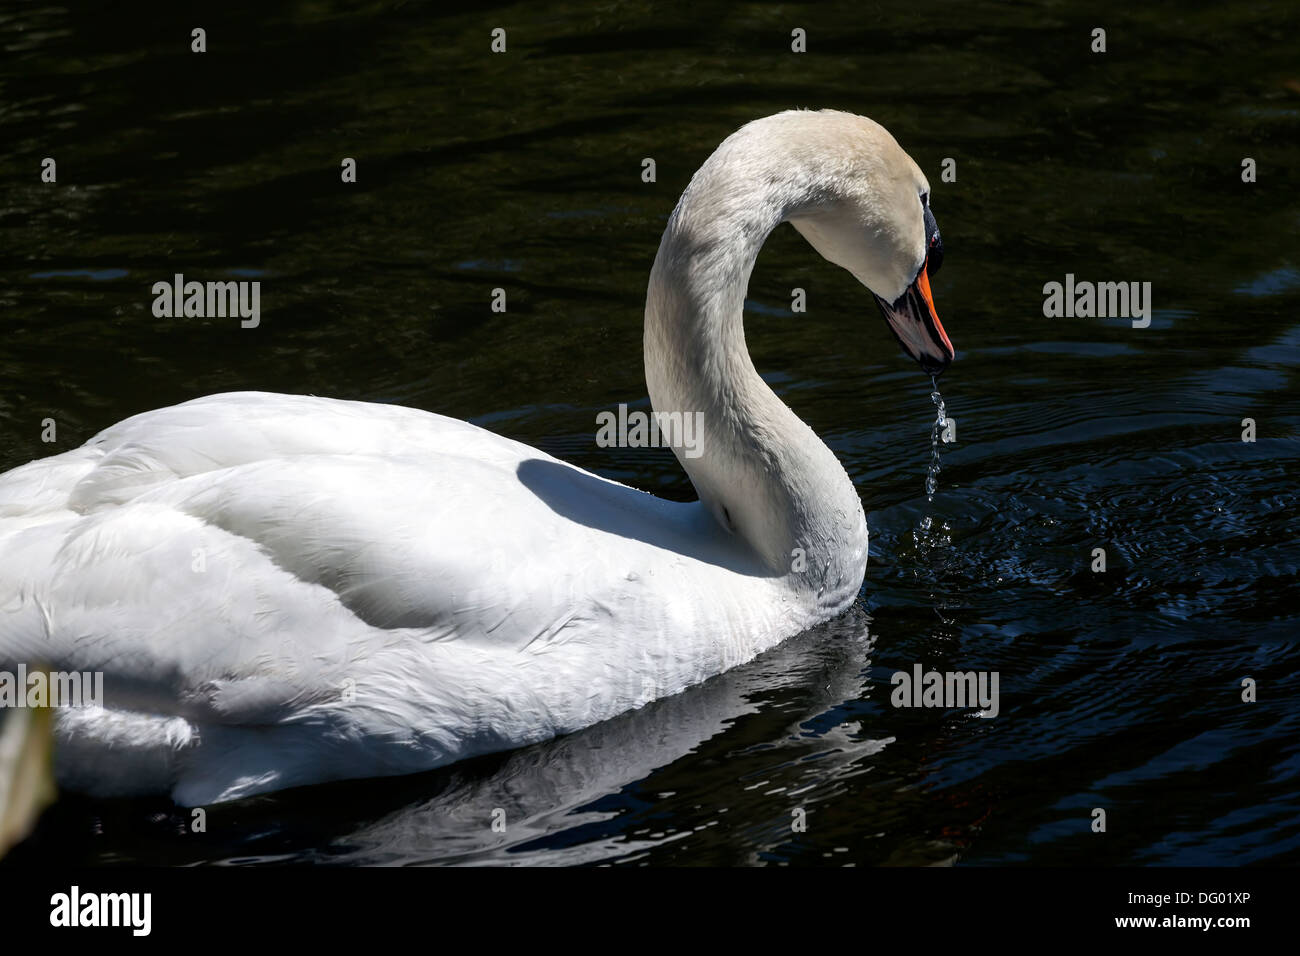 White Swan (Cygnus Anatidae) swimming in pond. - Stock Image